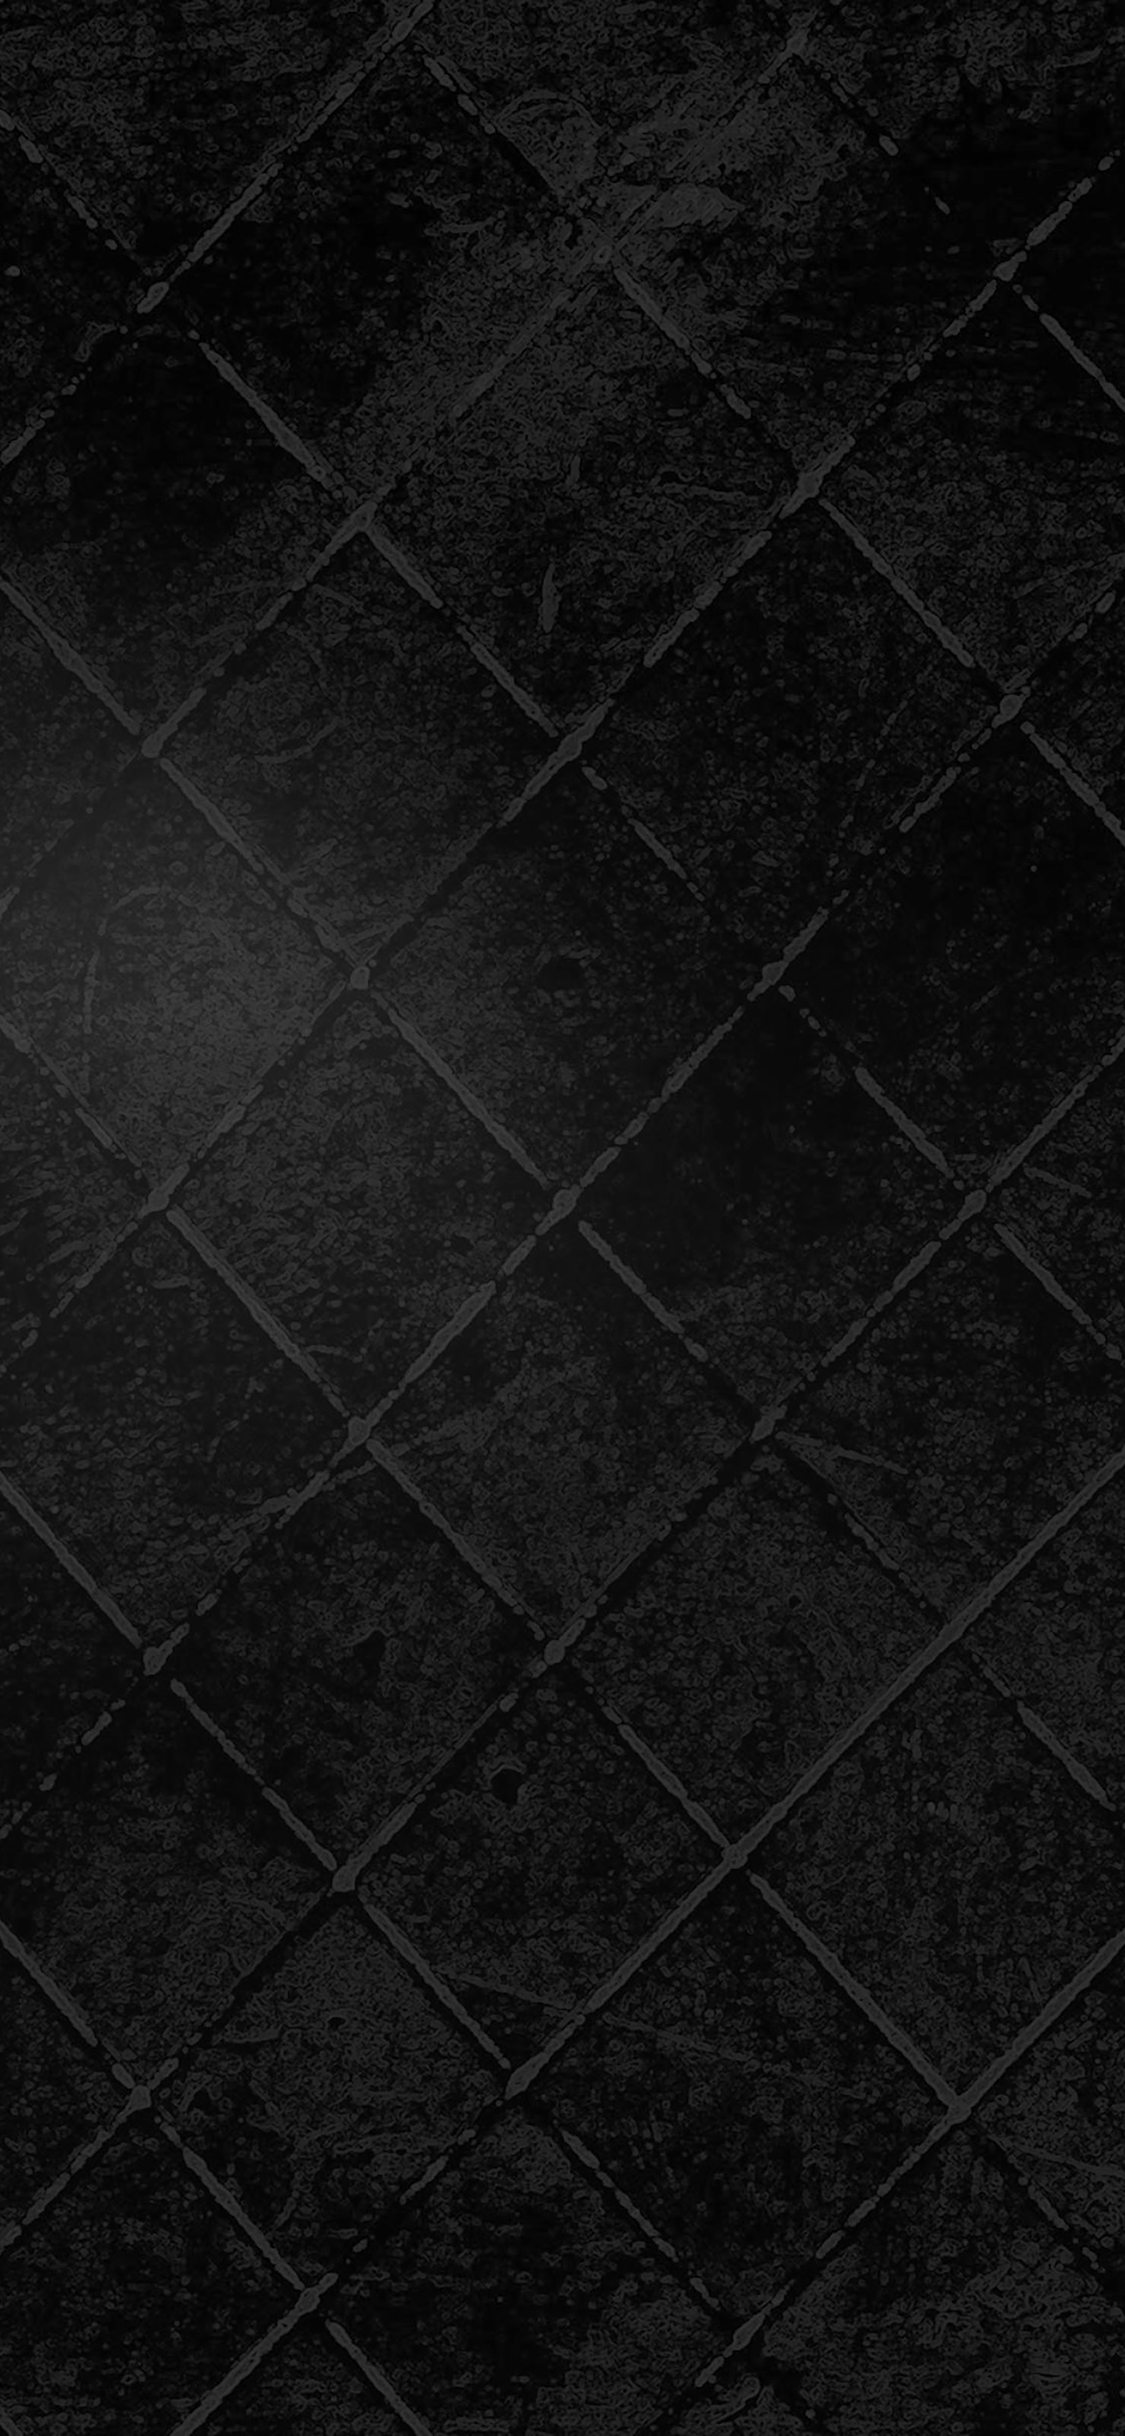 iPhoneXpapers.com-Apple-iPhone-wallpaper-vb79-wallpaper-dark-black-grunge-pattern